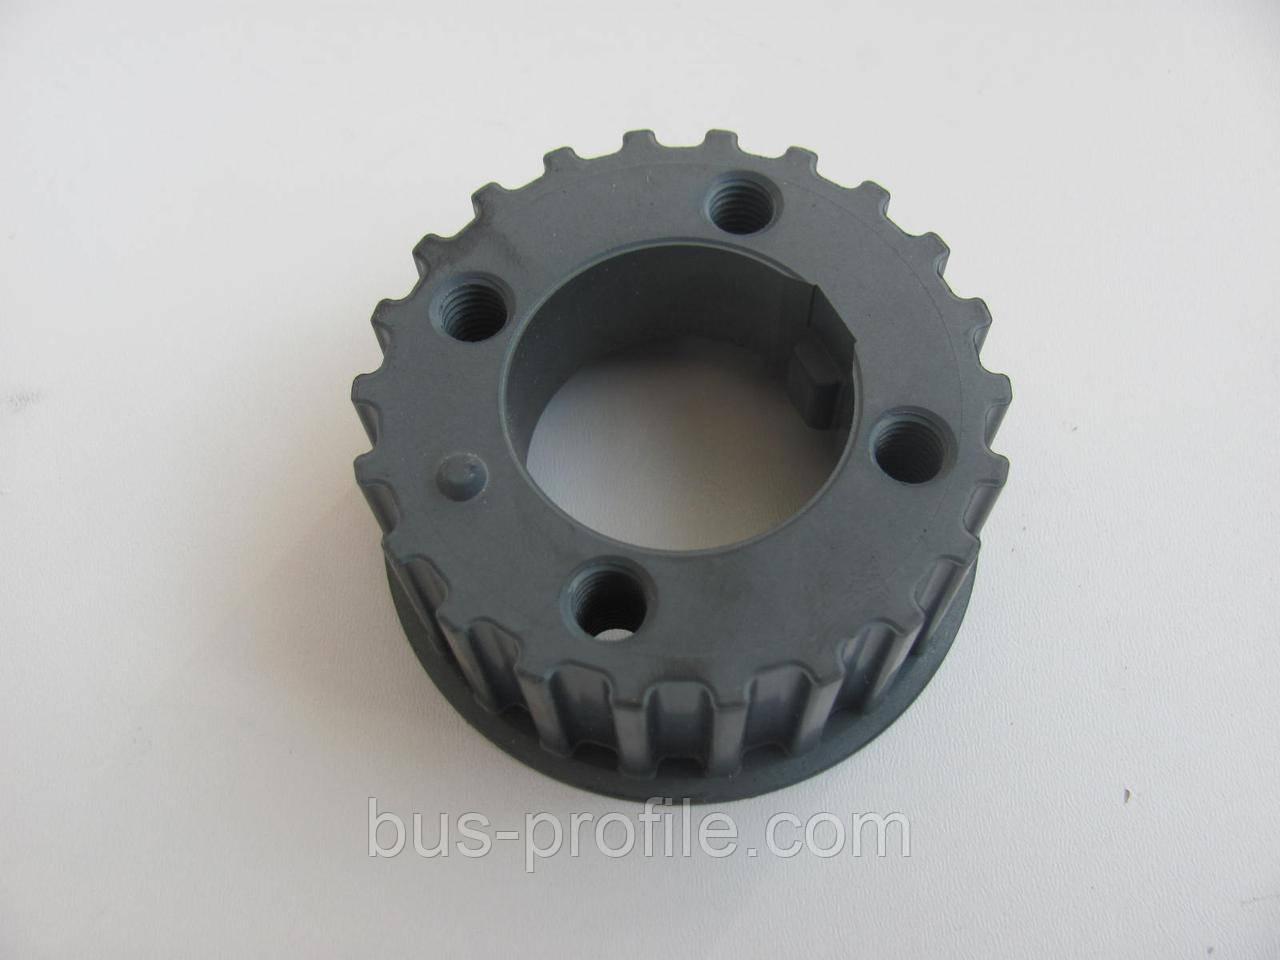 Шестерня коленвала VW T4 2.4D/LT/T4 2.5TDI, 98-/Crafter 2.5TDI, 06- (большая шпонка) — FEBI BILSTEIN — 36581